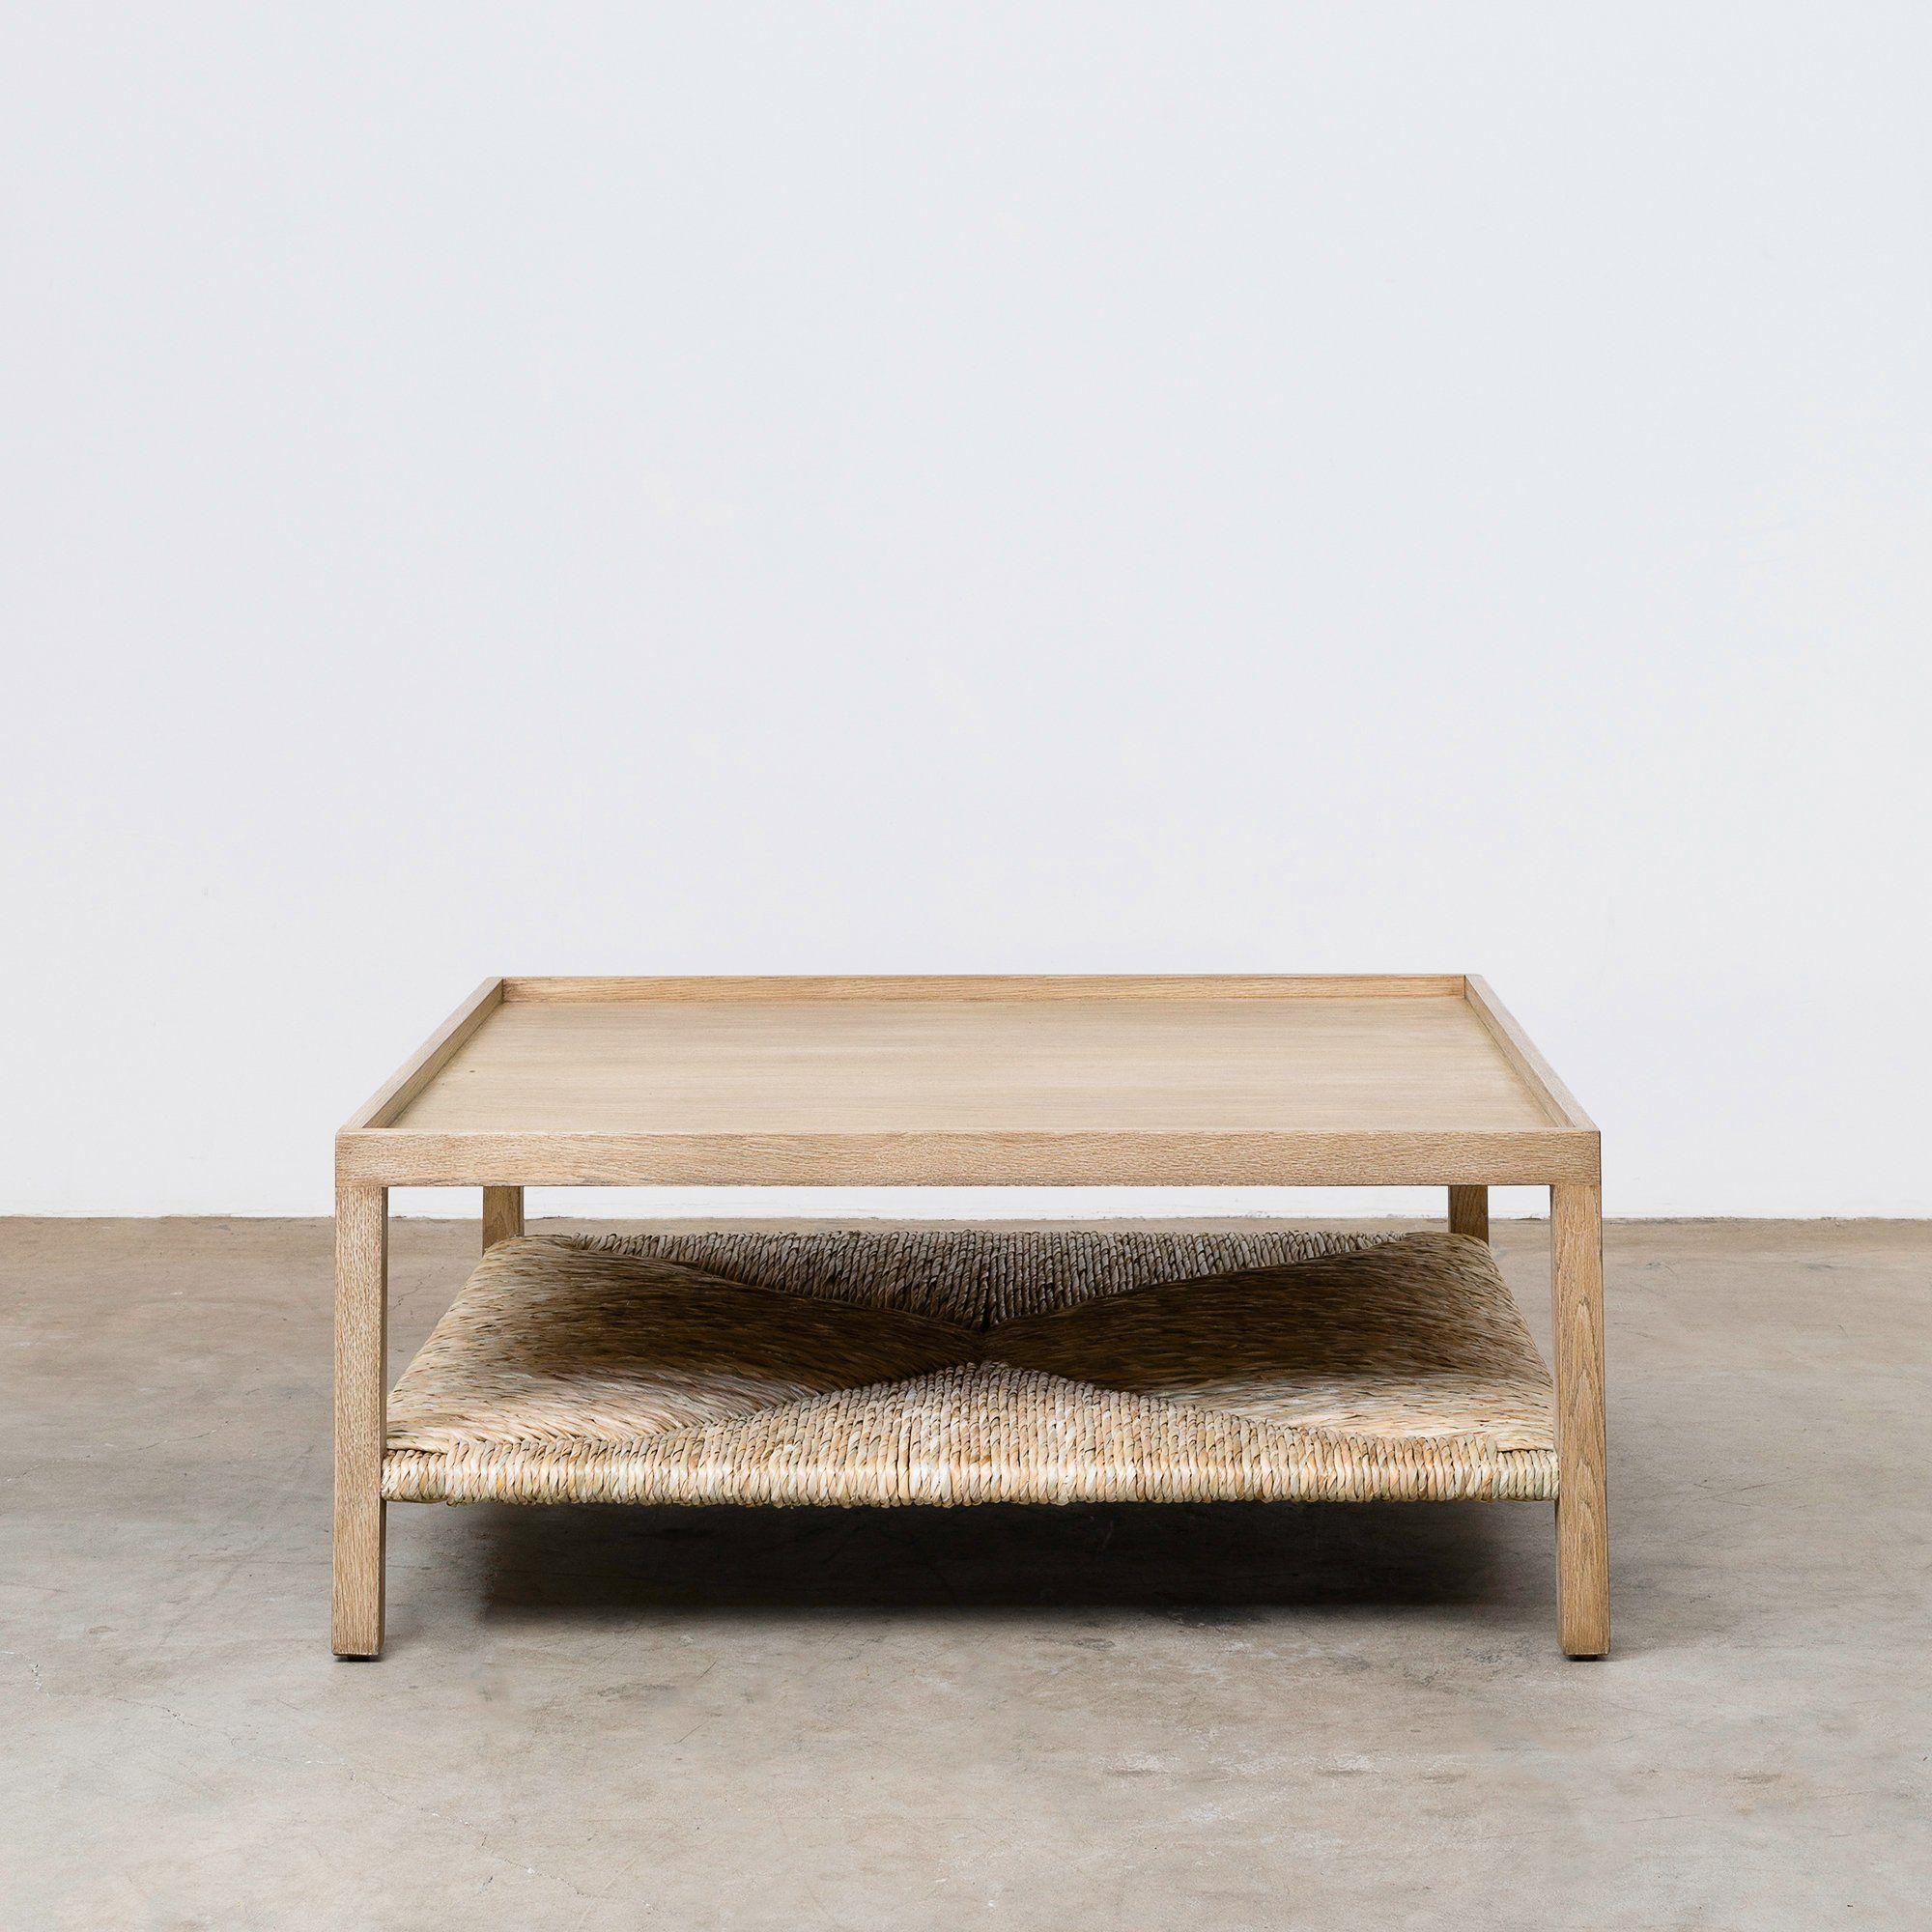 Arcadia Coffee Table In 2021 Coffee Table Furniture White Oak Coffee Table [ 2000 x 2000 Pixel ]